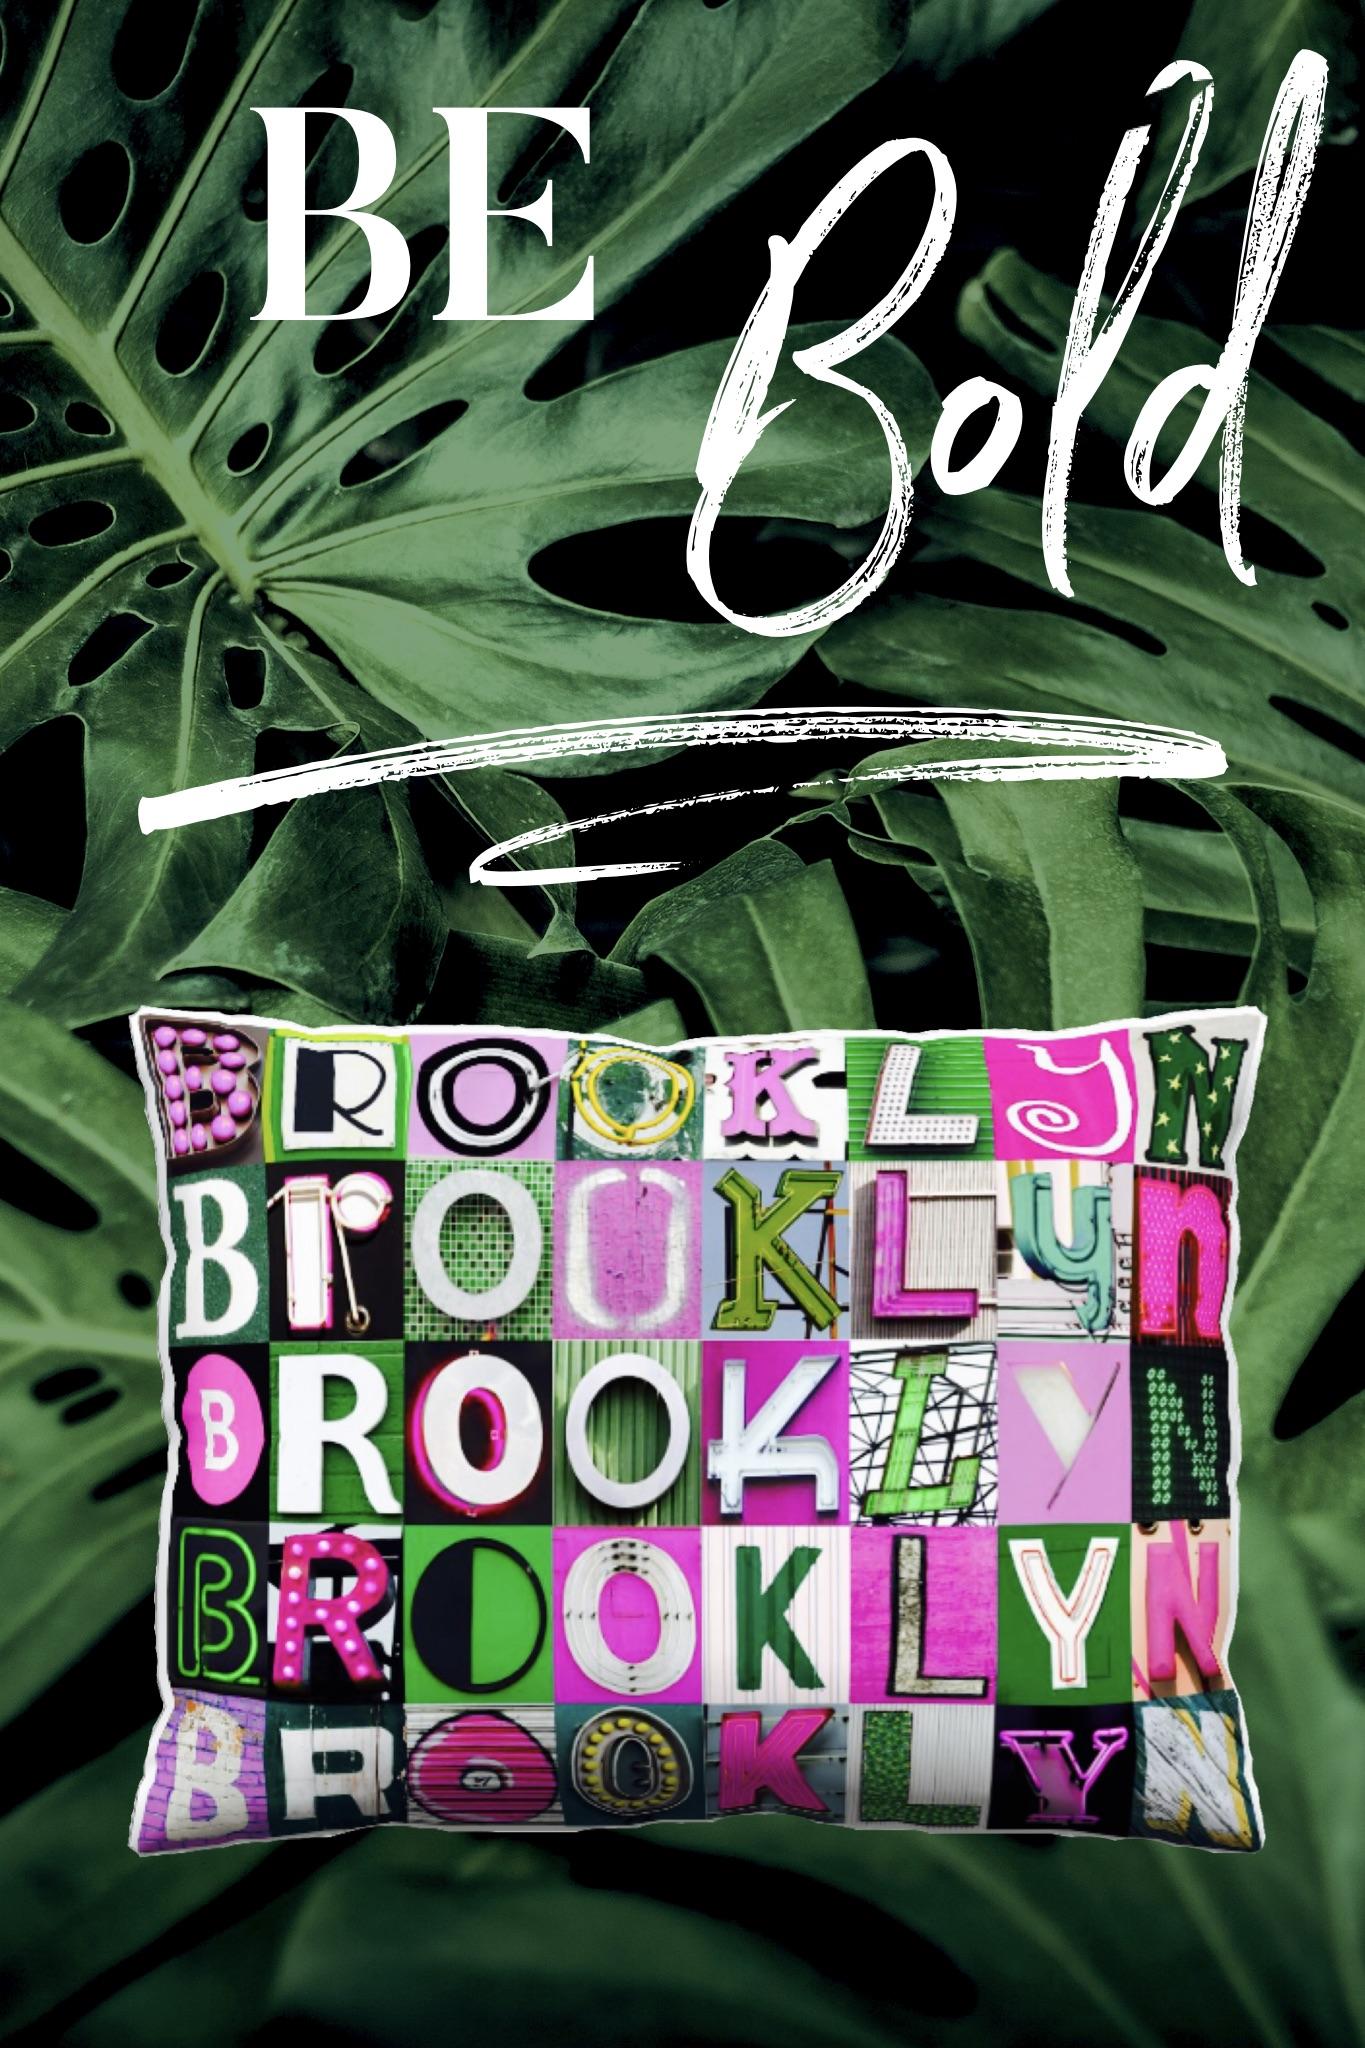 BrooklynBeBoldPost.jpg